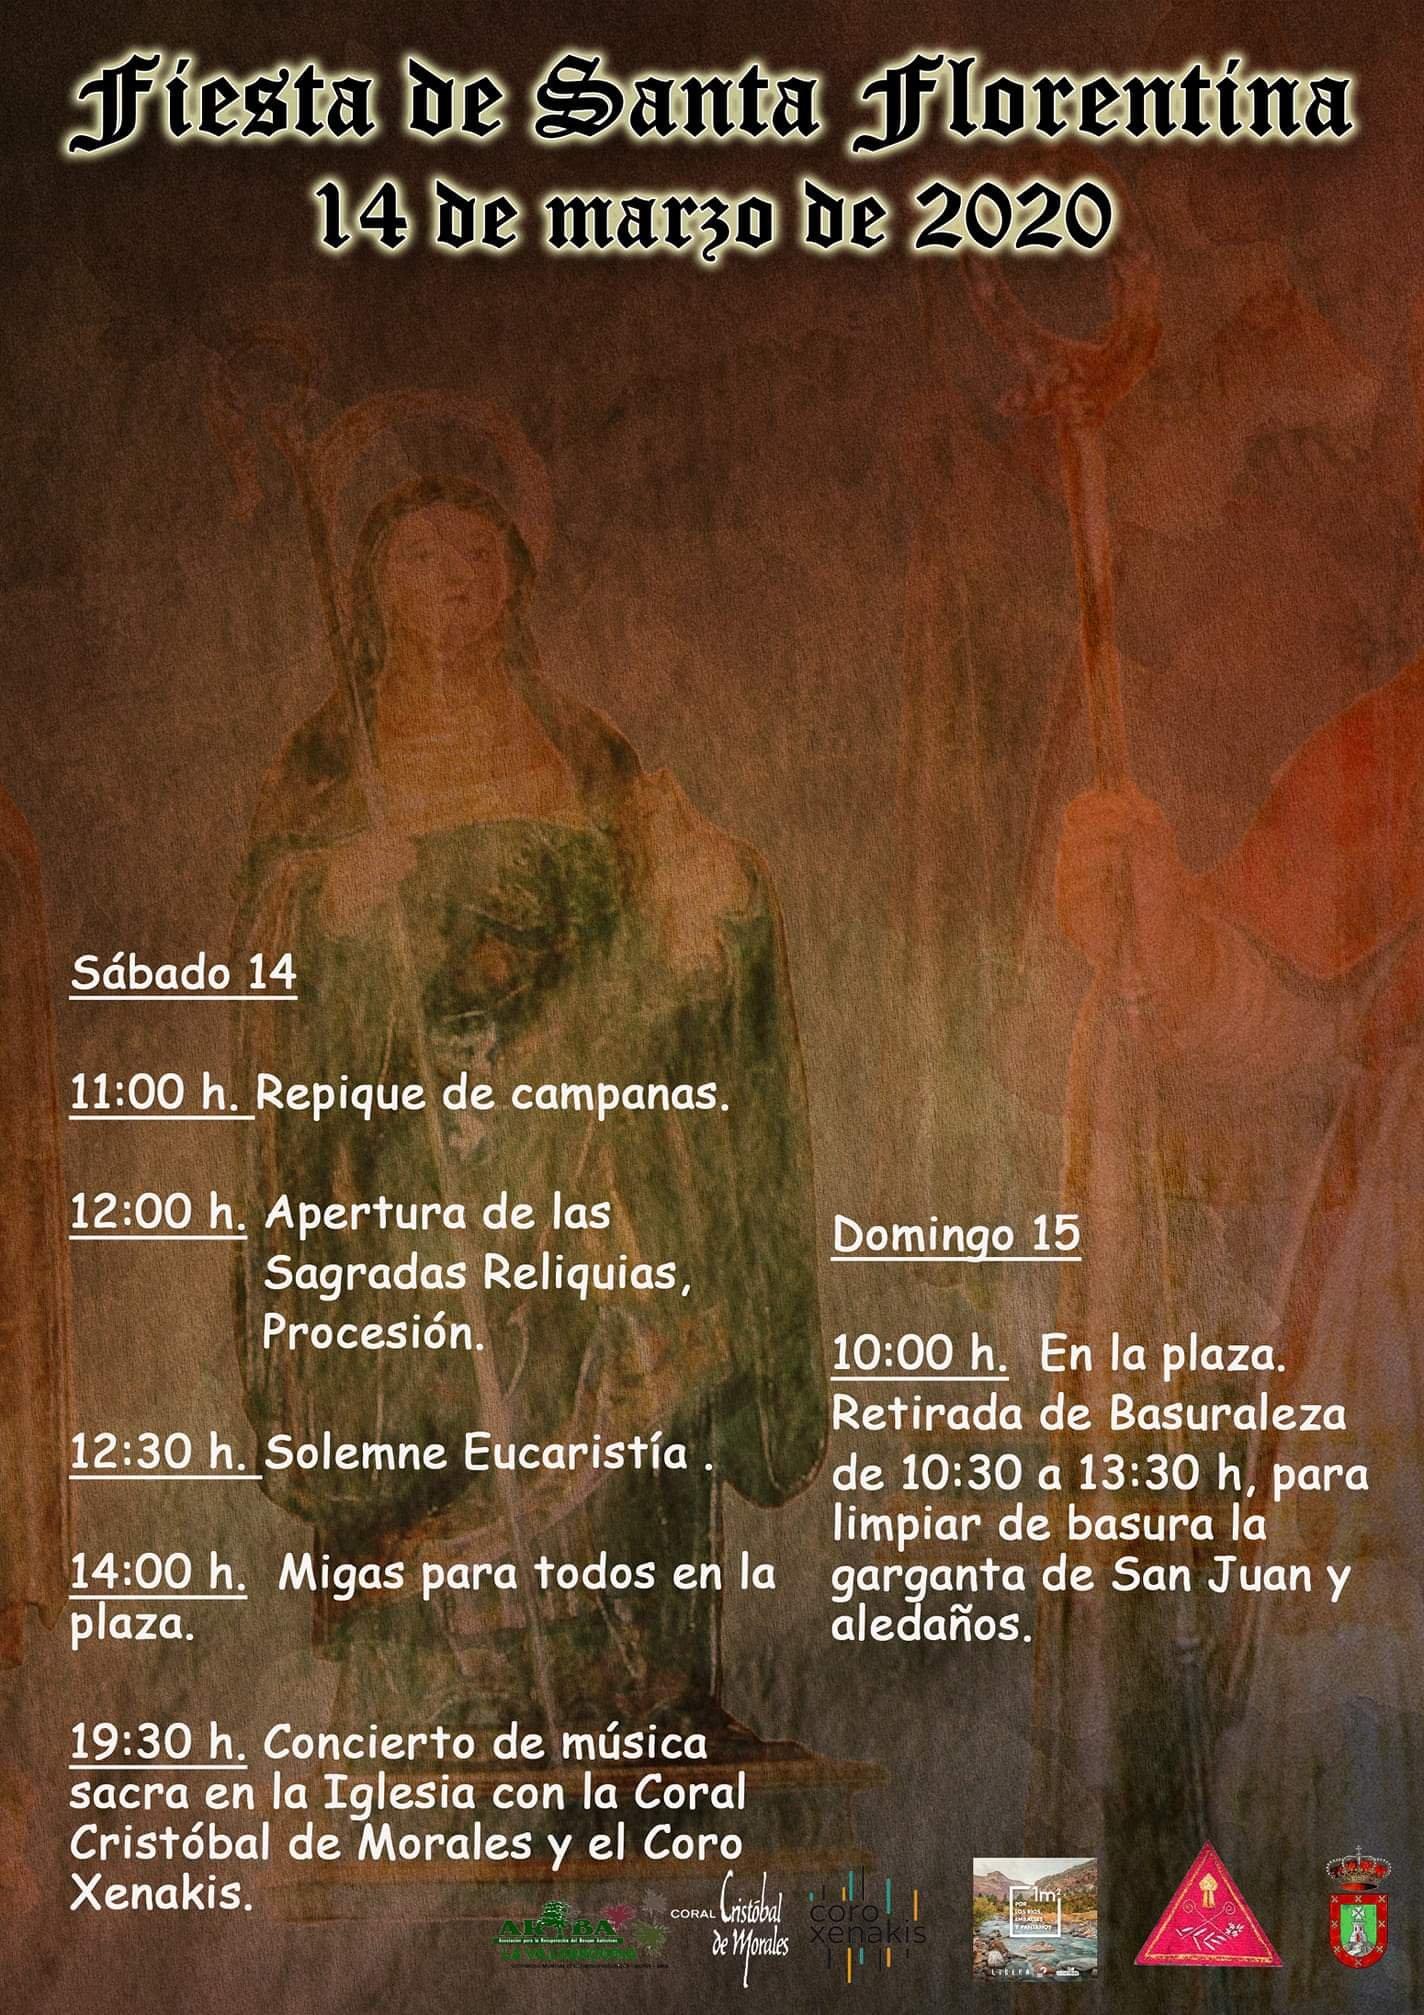 Fiesta de Santa Florentina 2020 - Berzocana (Cáceres)